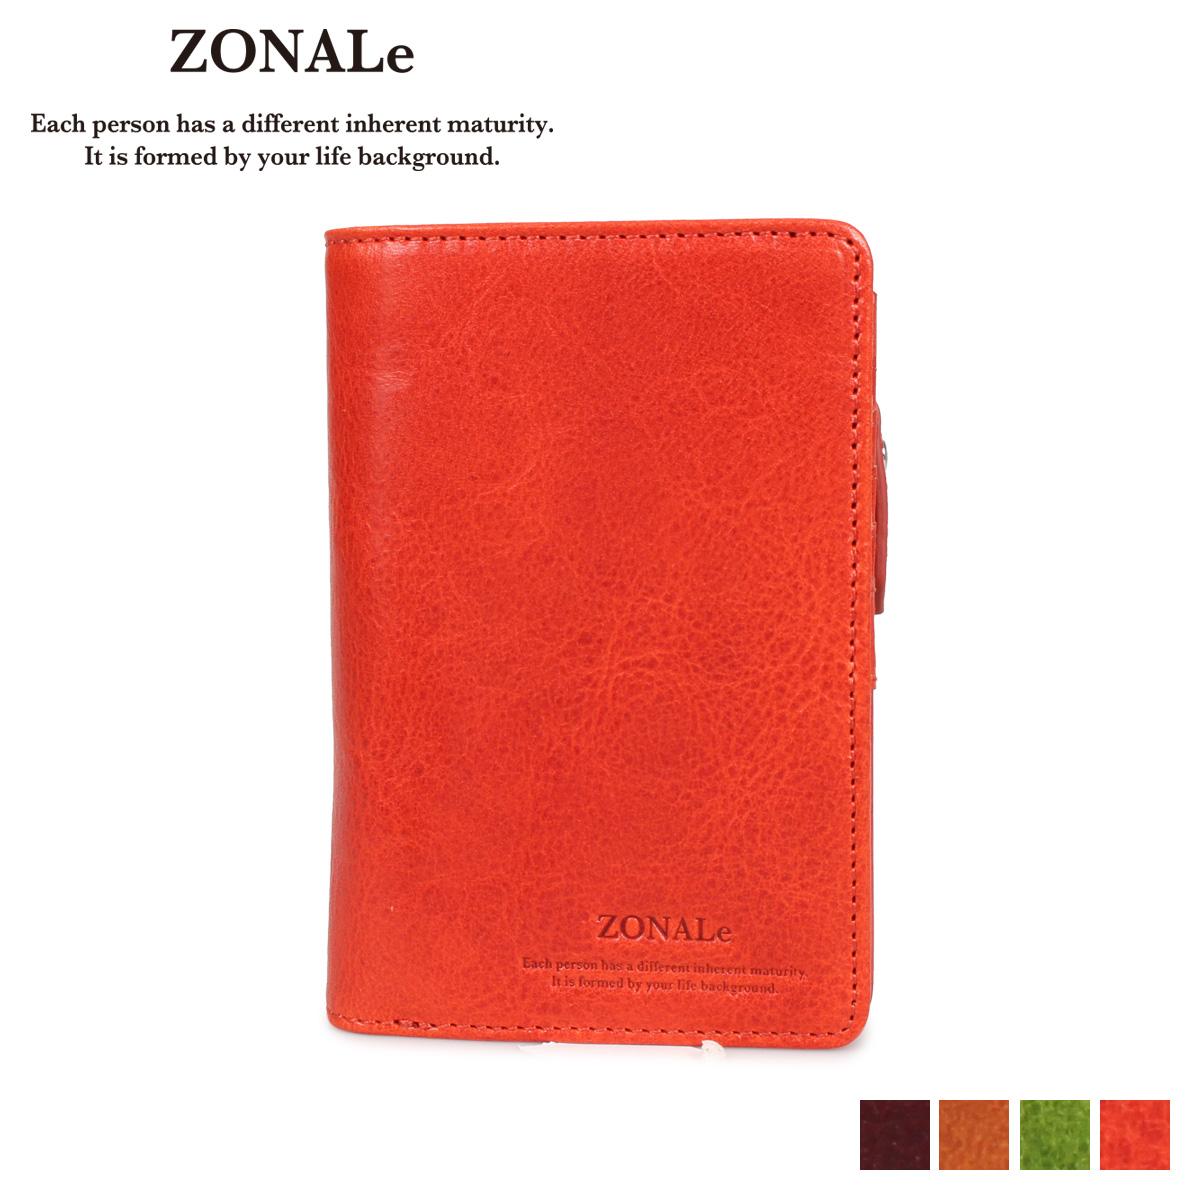 ZONALE ゾナール 財布 二つ折り メンズ 本革 RENZINA ブラウン キャメル グリーン オレンジ 31085 [4/6 新入荷]